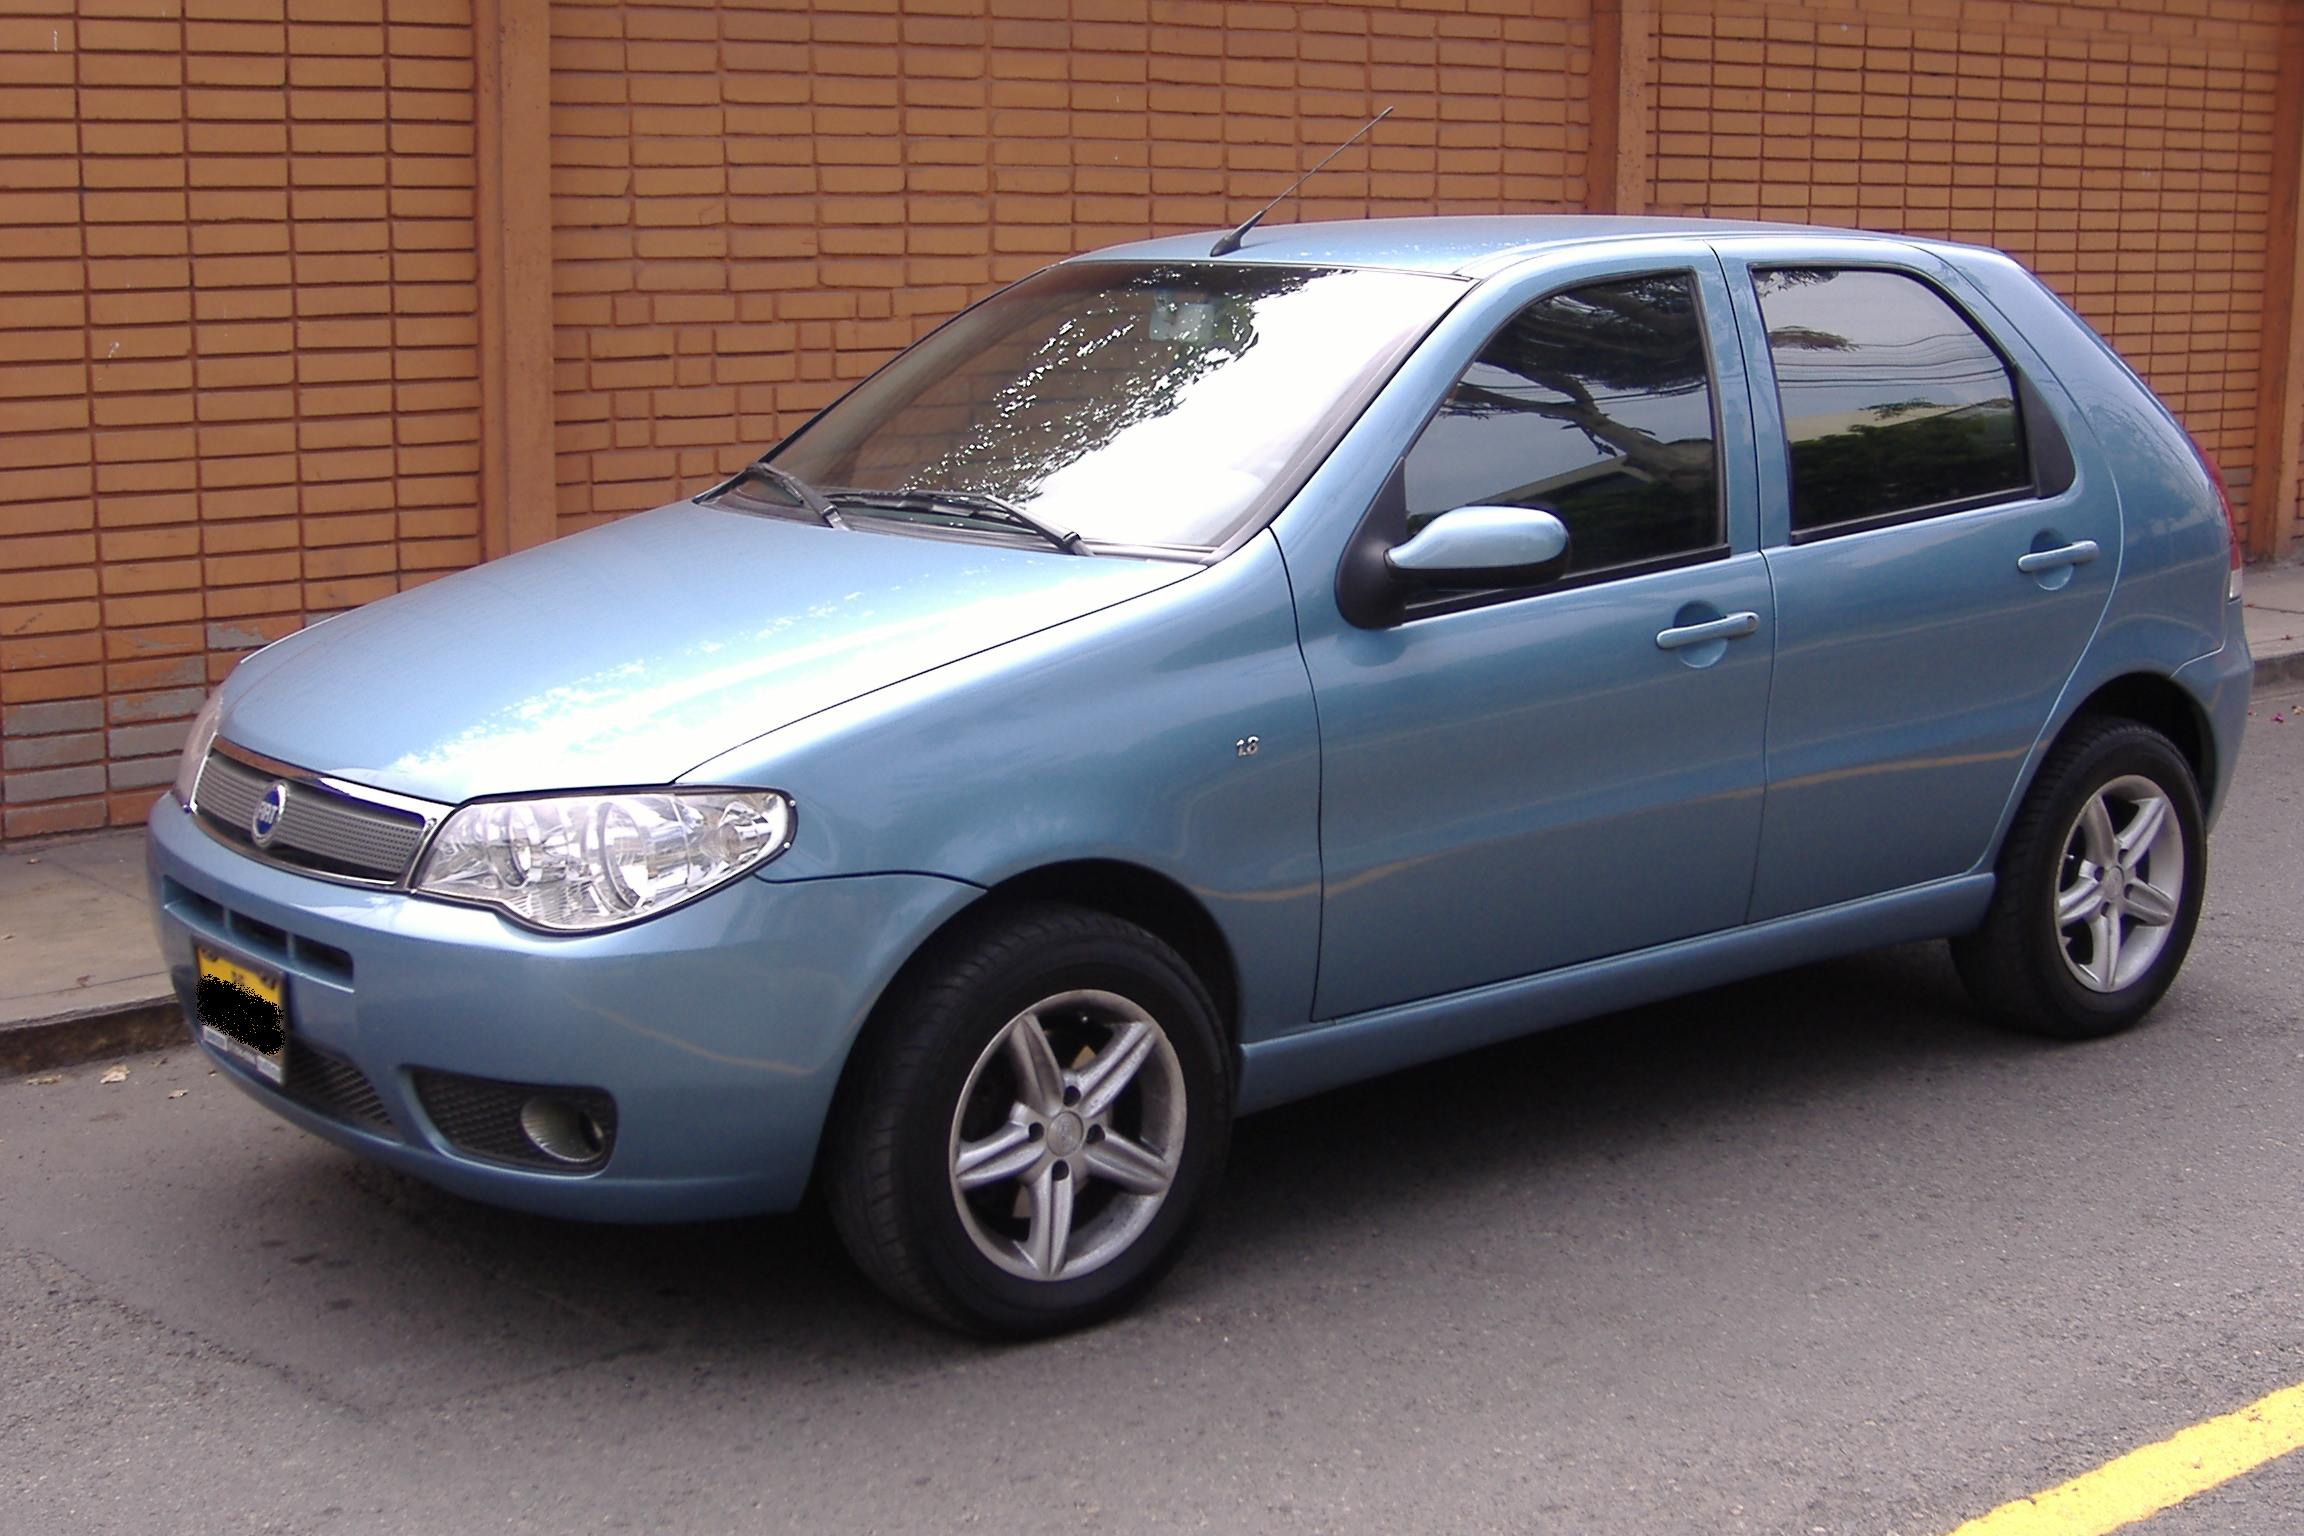 Fiat palio photo 04